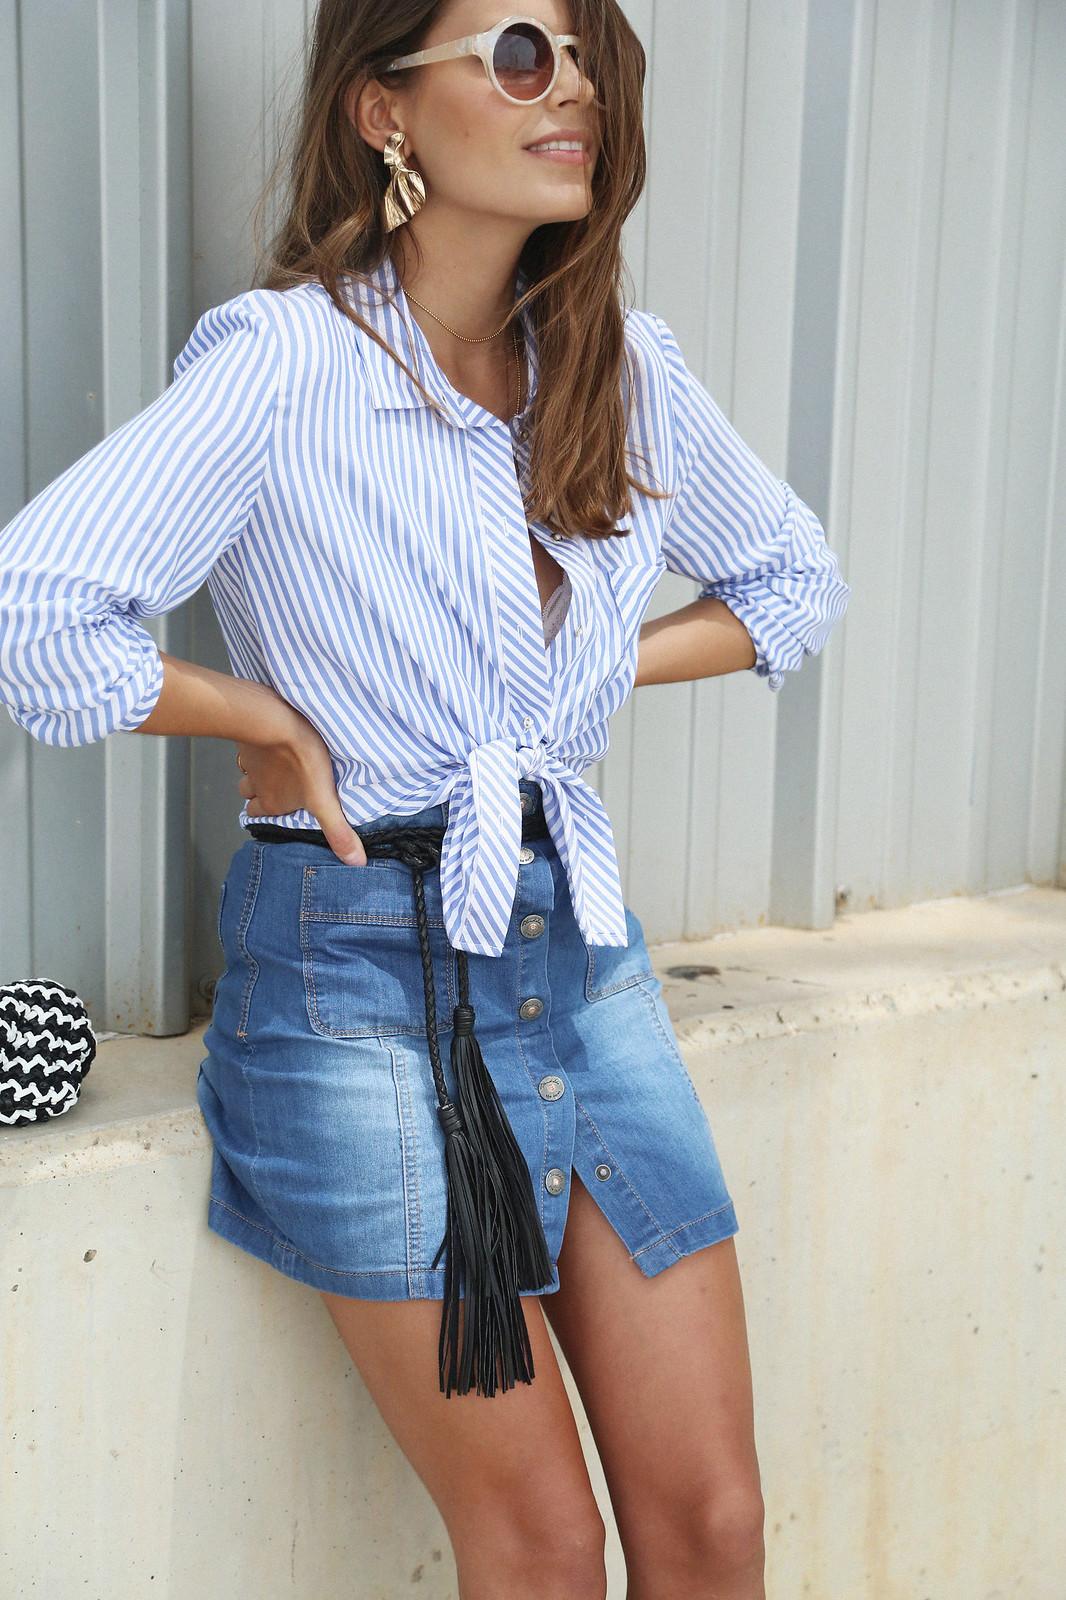 jessie chanes seams for a desire denim skirt stripes shirt-13